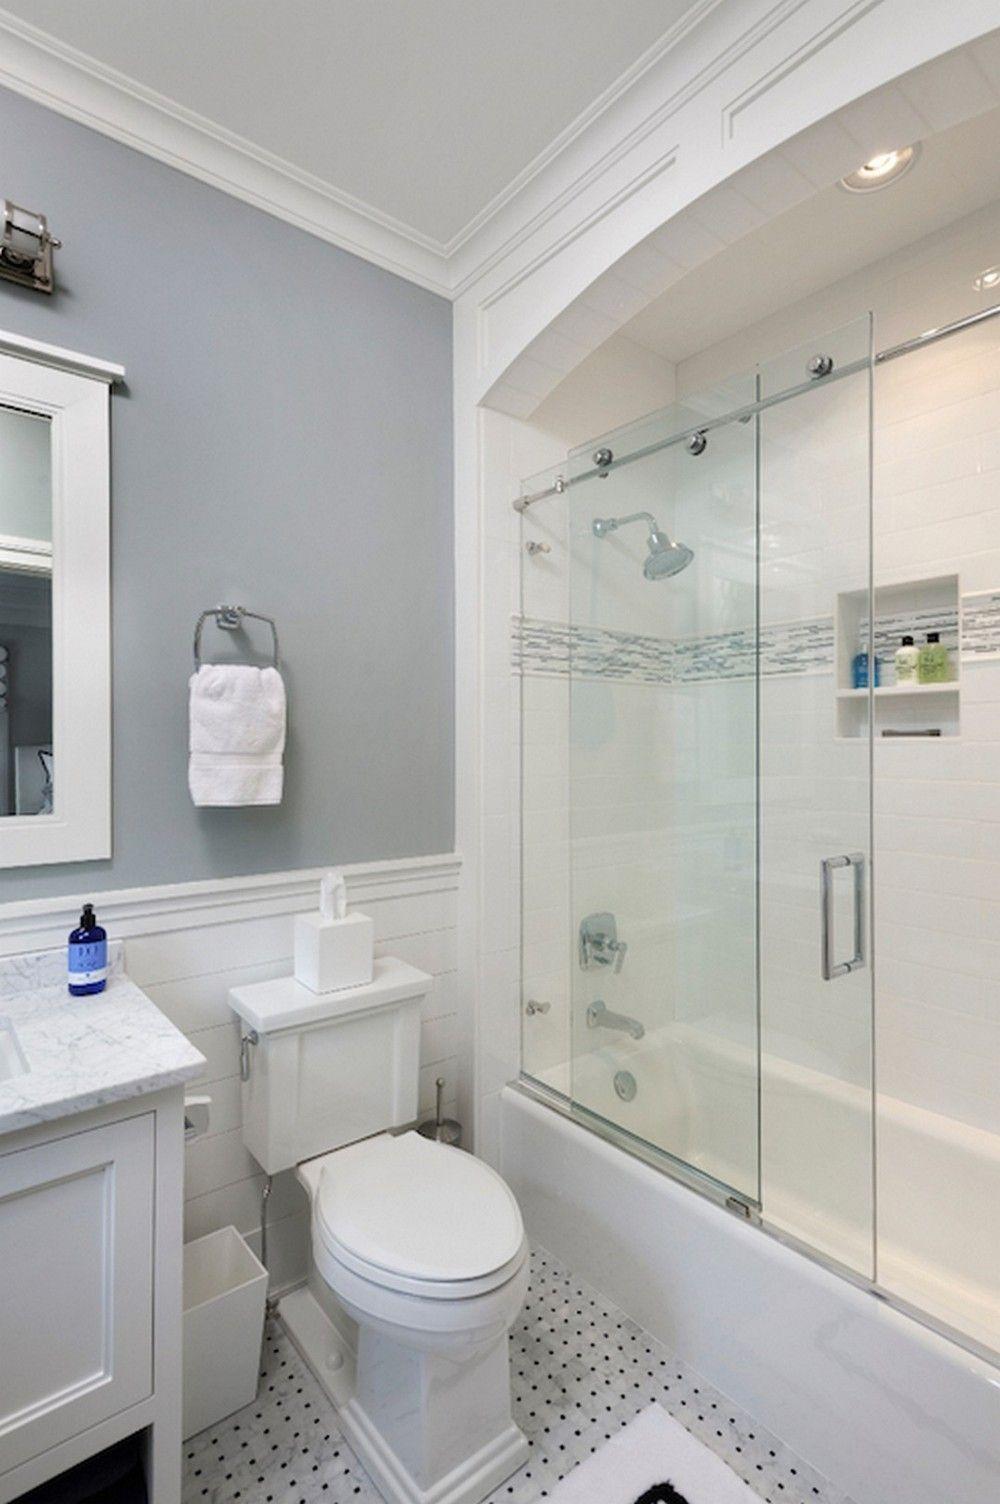 Awesome 28 Design Tips To Make A Small Bathroom Better Https Fair Building A Small Bathroom Design Ideas